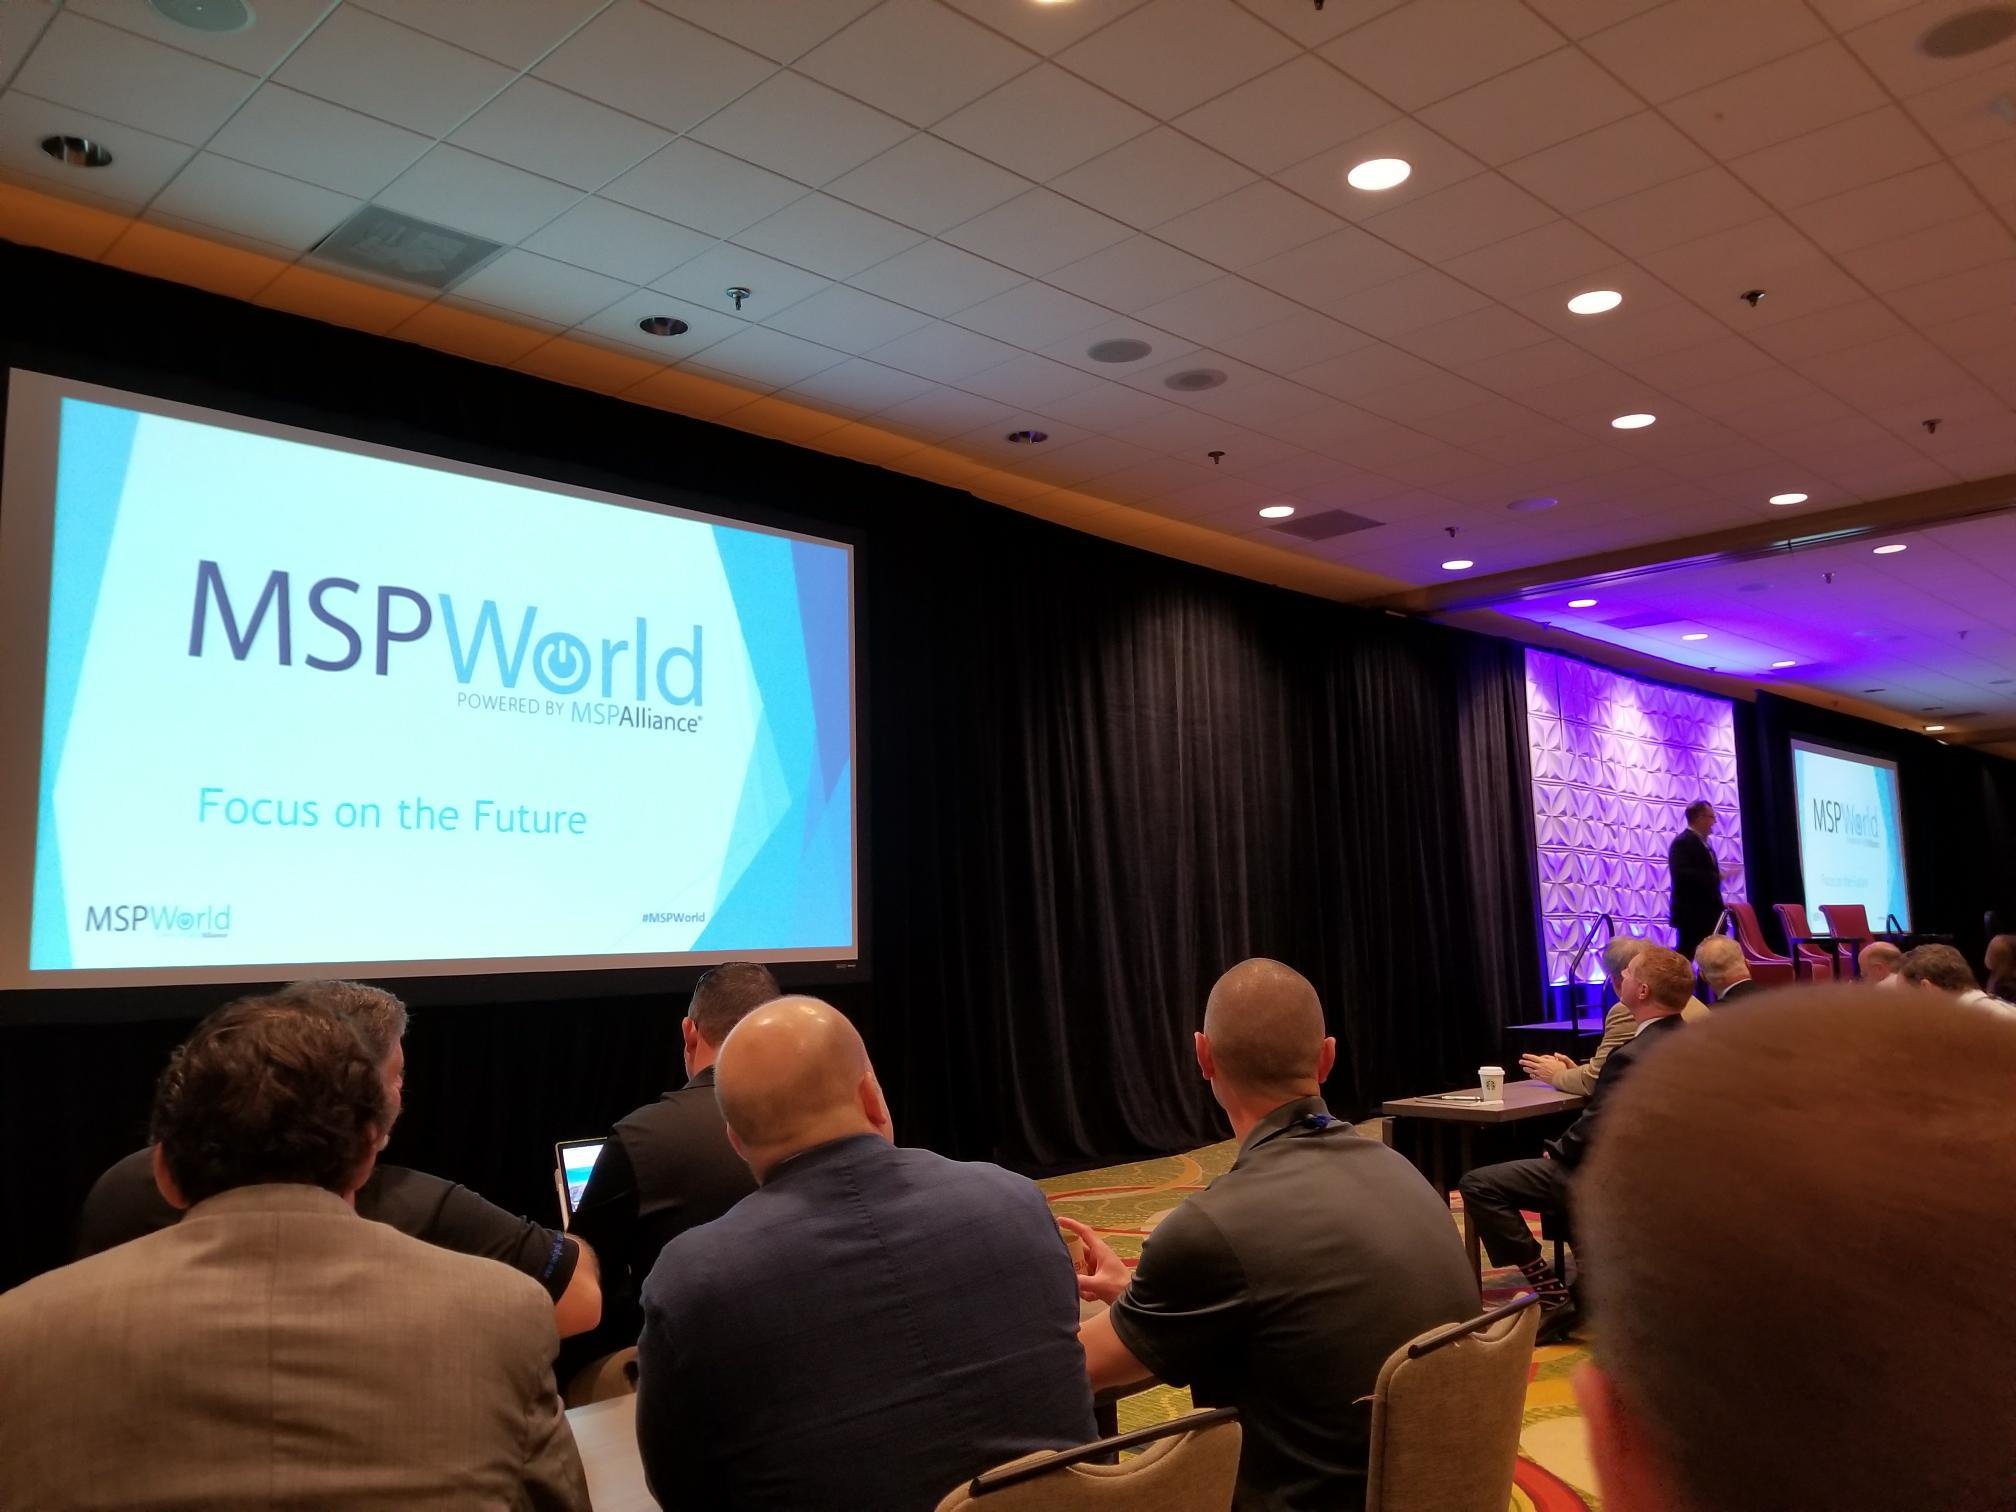 MSPWorld 2018 - Pioneer Technology